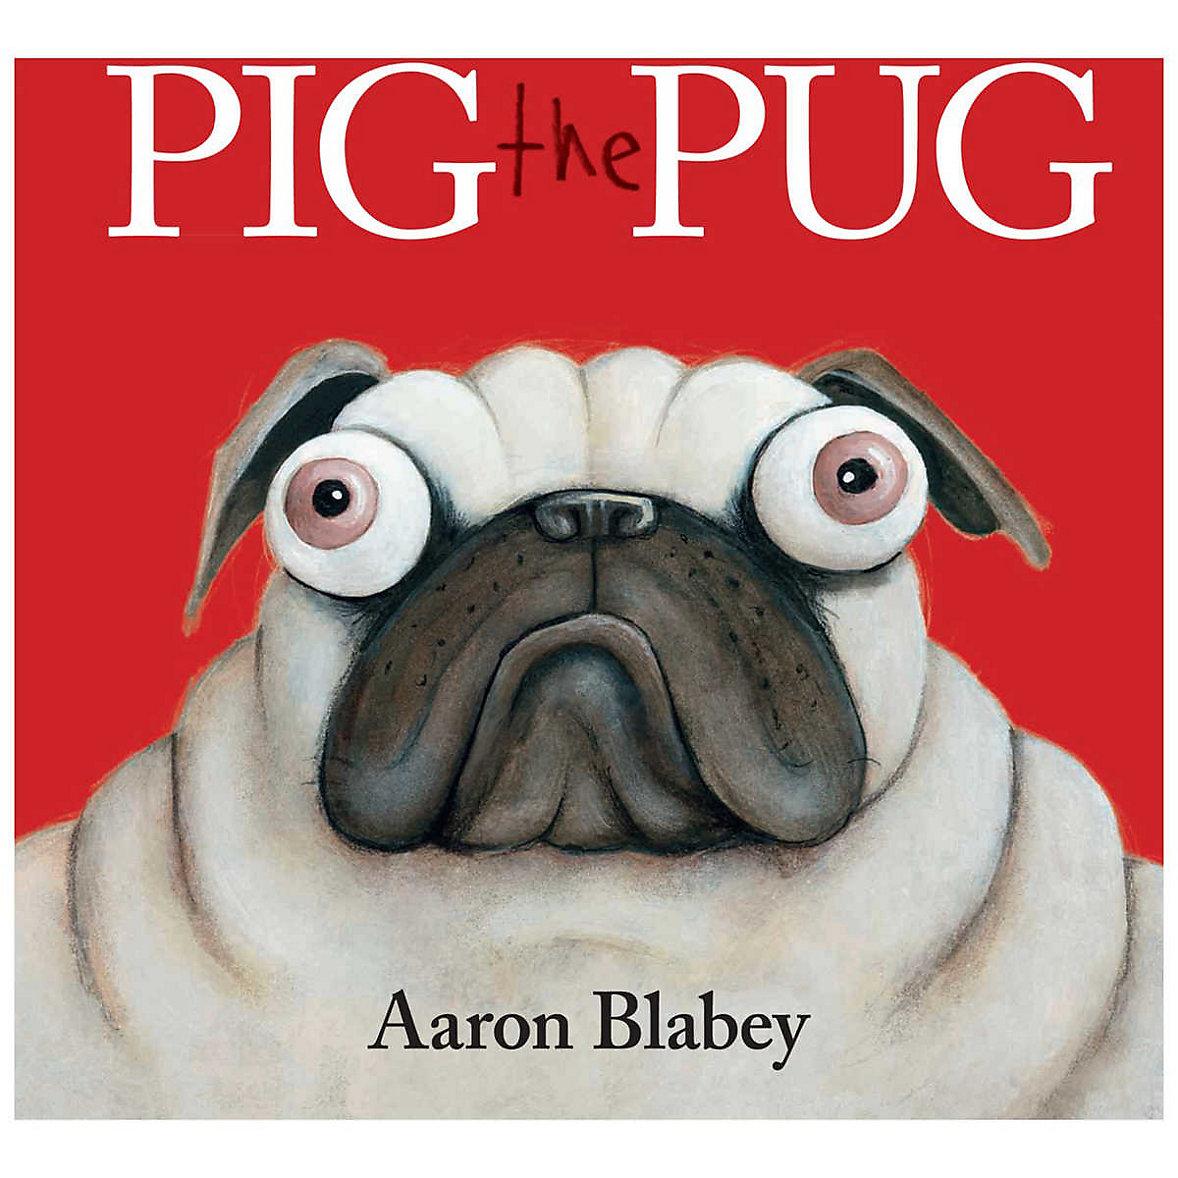 Pig the Pug - Aaron Blabey